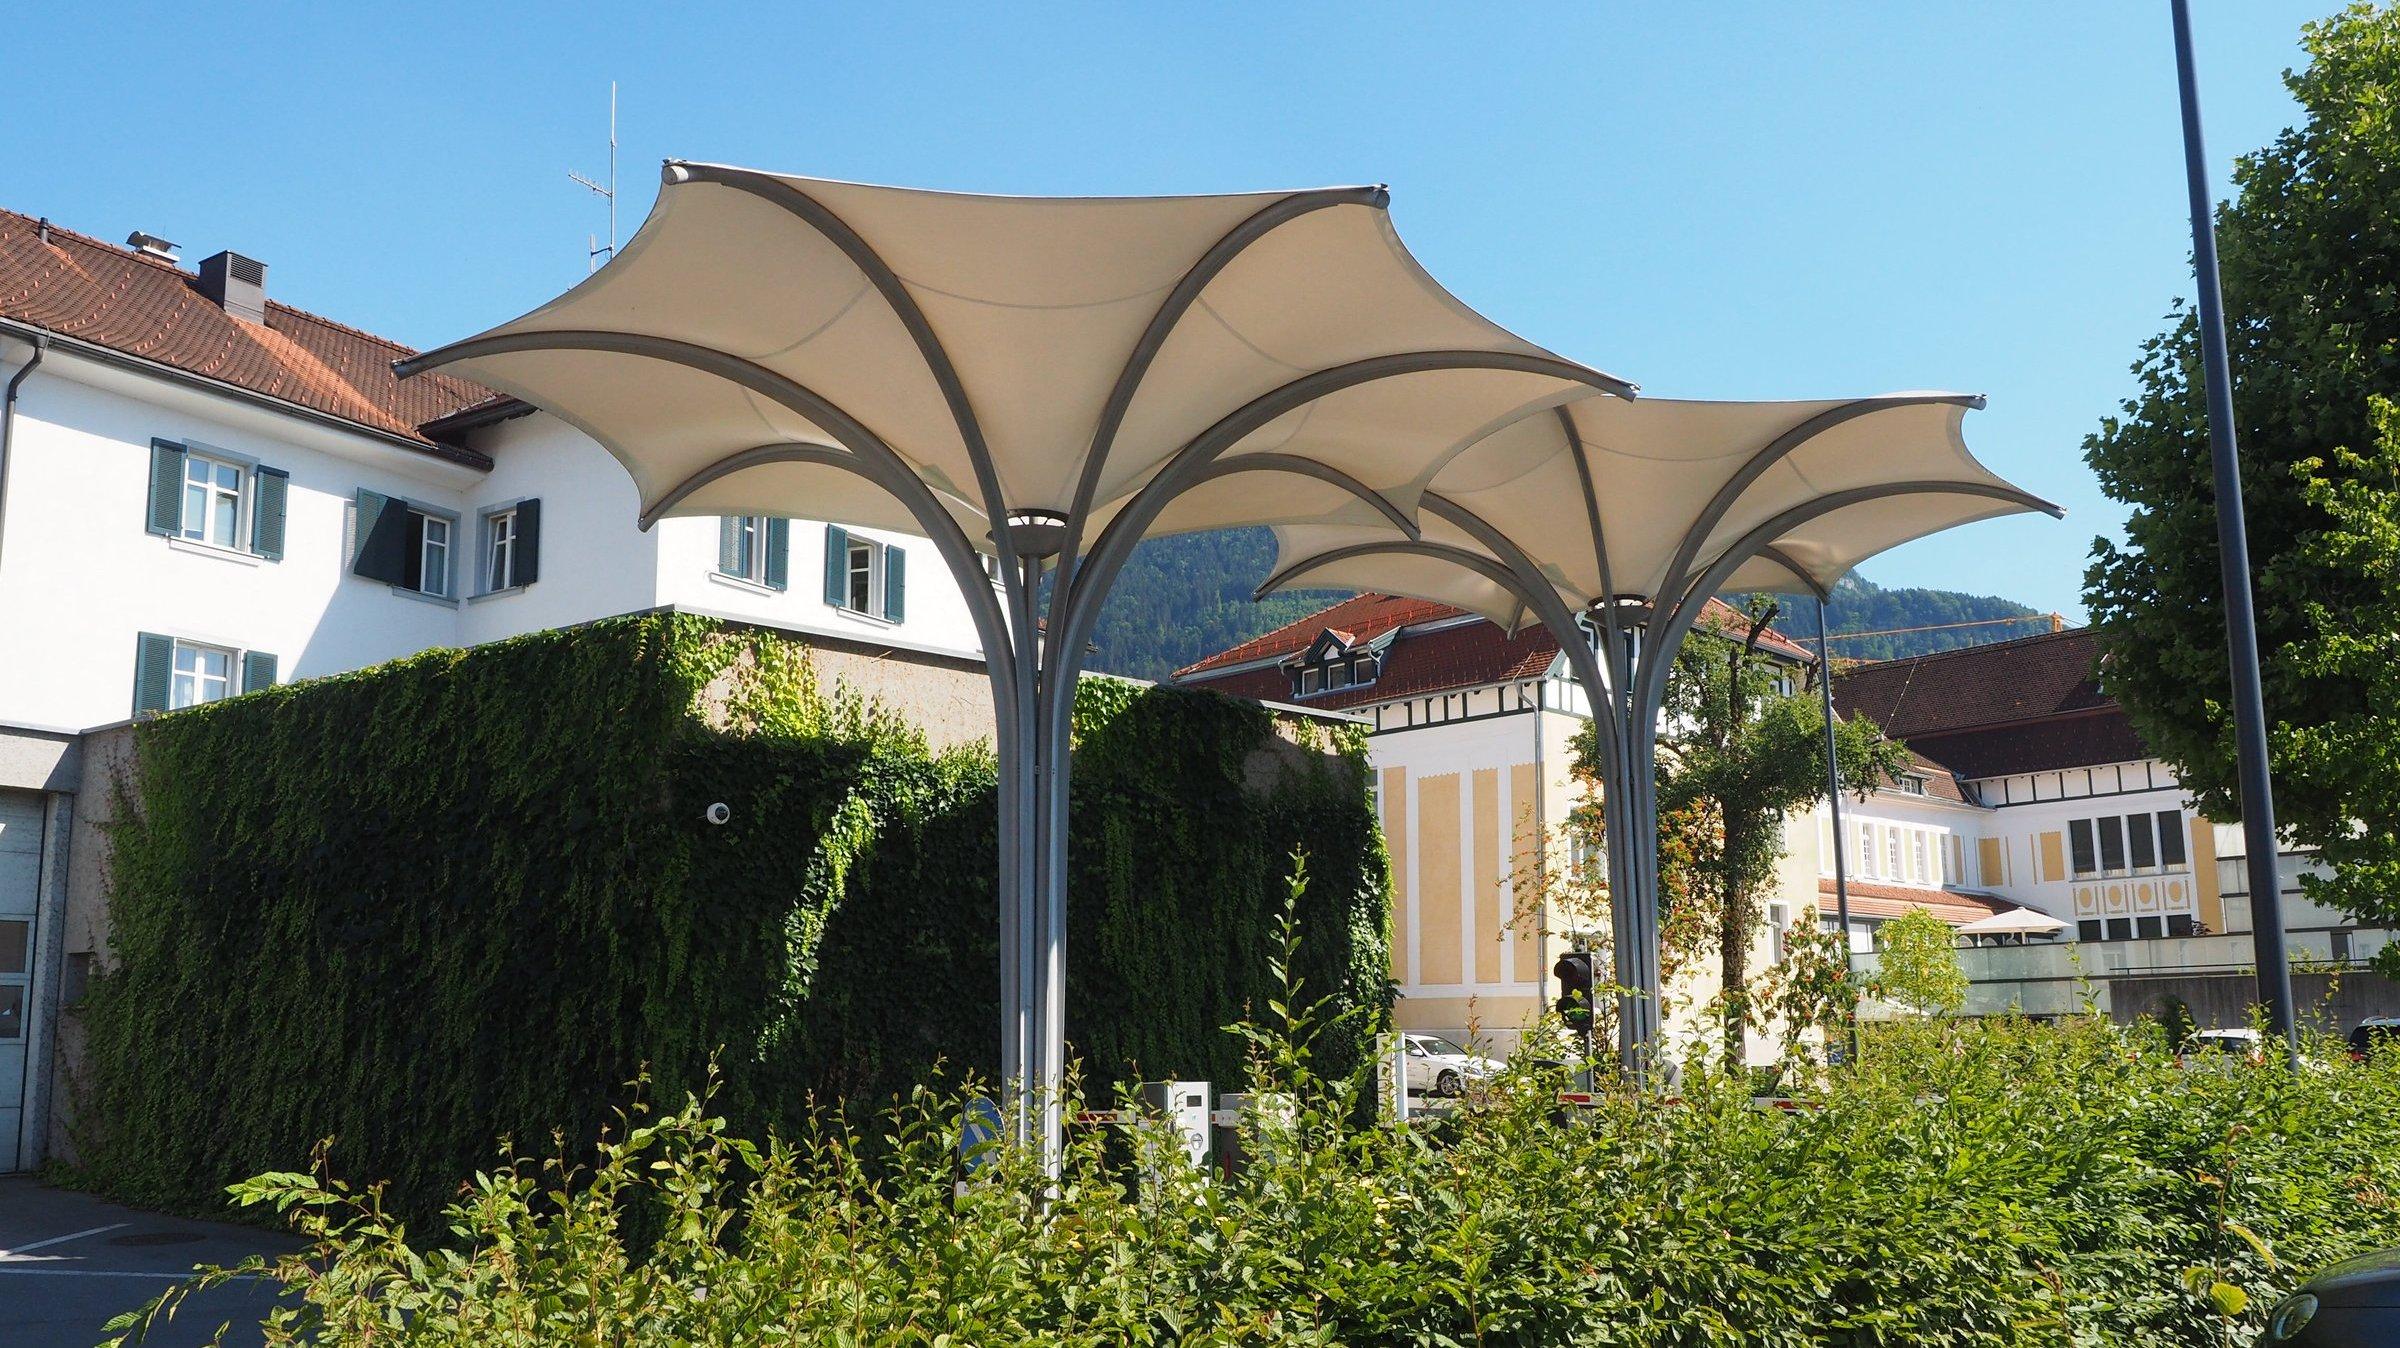 Textile Schirme, KH Hohenems  drexelarchitekten